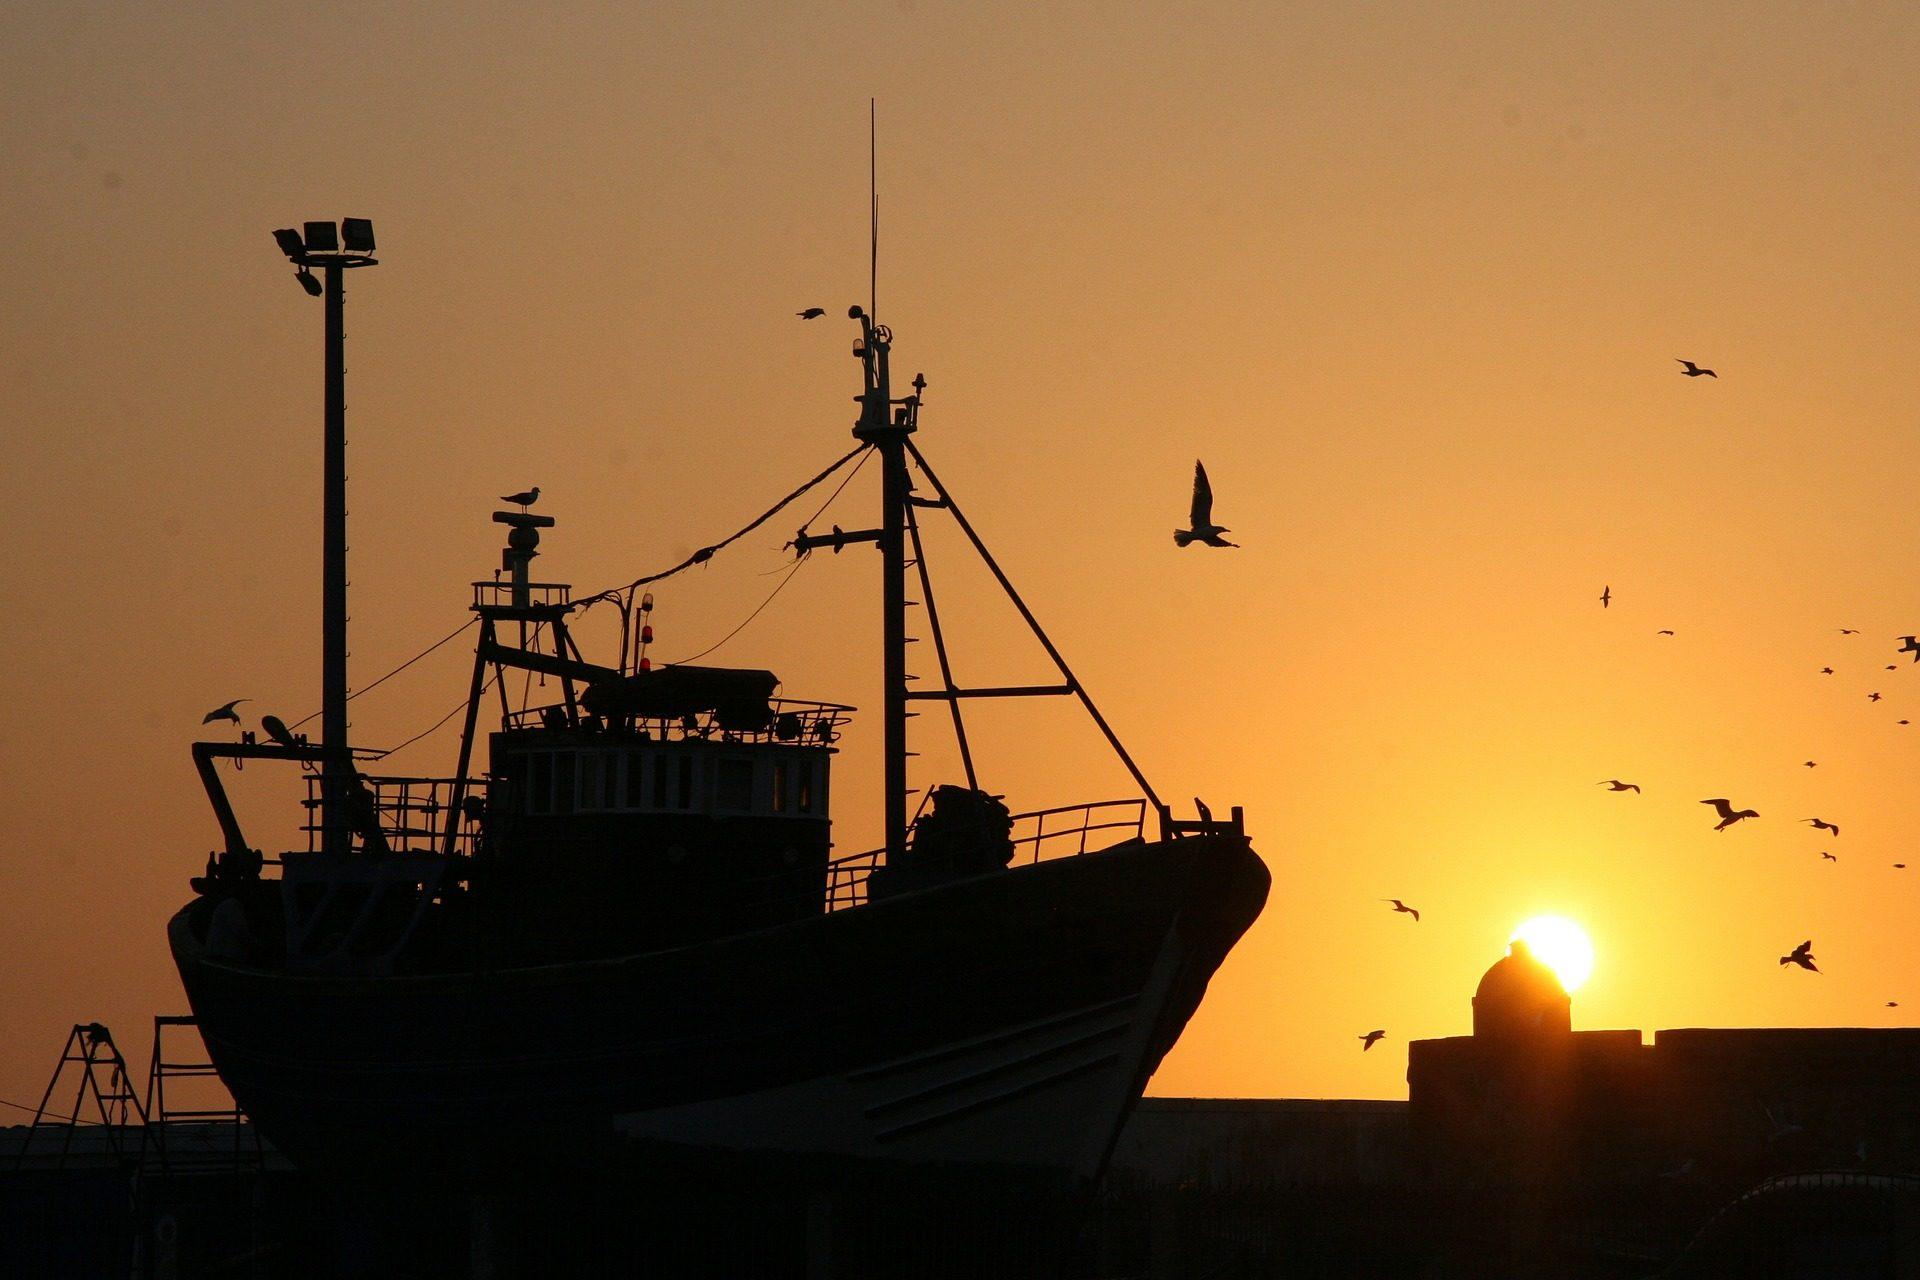 नाव, pesquero, मछली पकड़ने, seagulls, सूर्यास्त, सागर, छायादार - HD वॉलपेपर - प्रोफेसर-falken.com